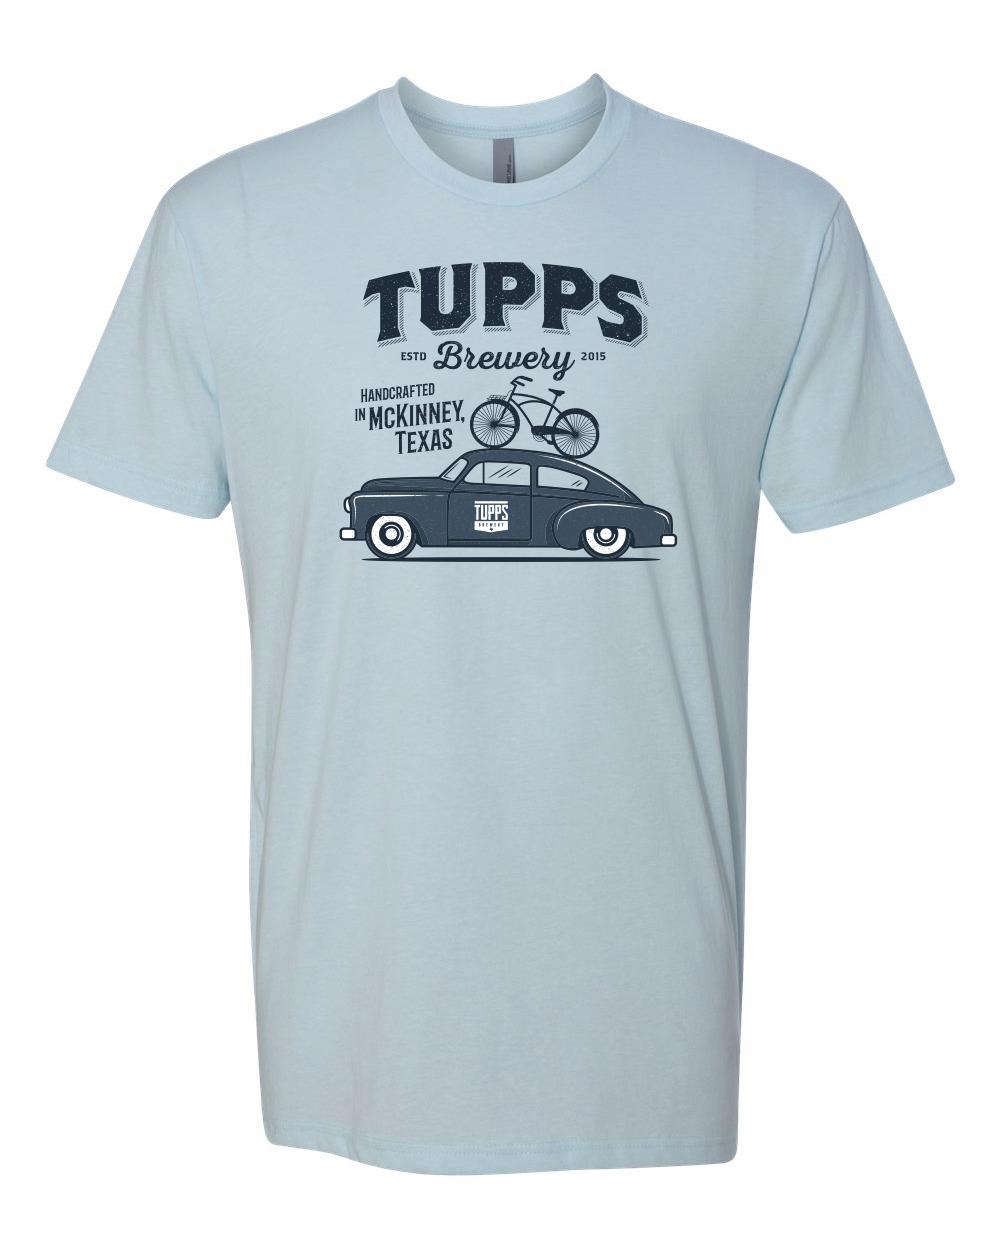 Dallas - Tupps Brewery